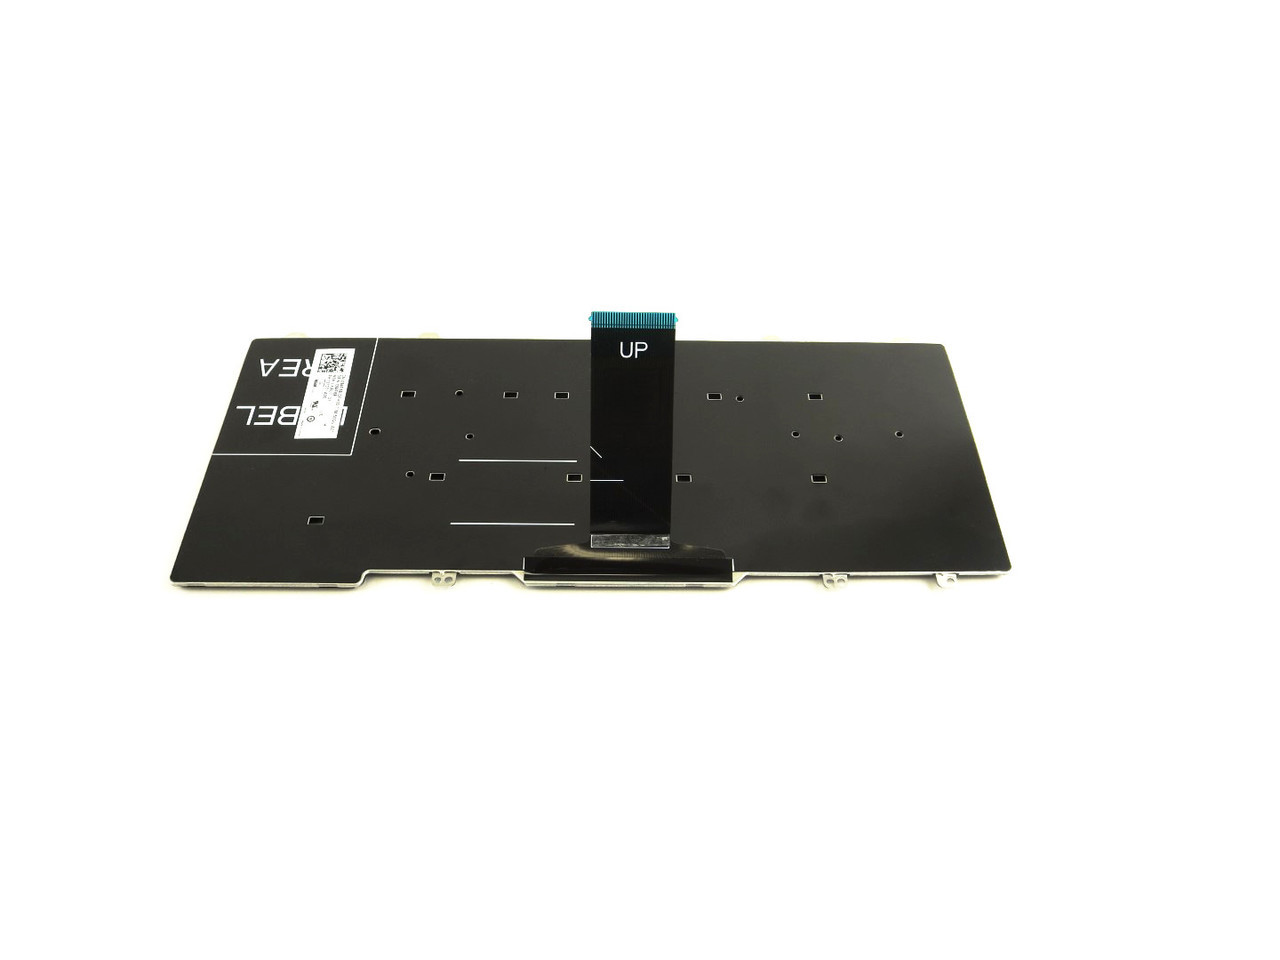 Dell Latitude E5470 3340 E7450 E5450 5480 Laptop Keyboard - Single Point - 94F68